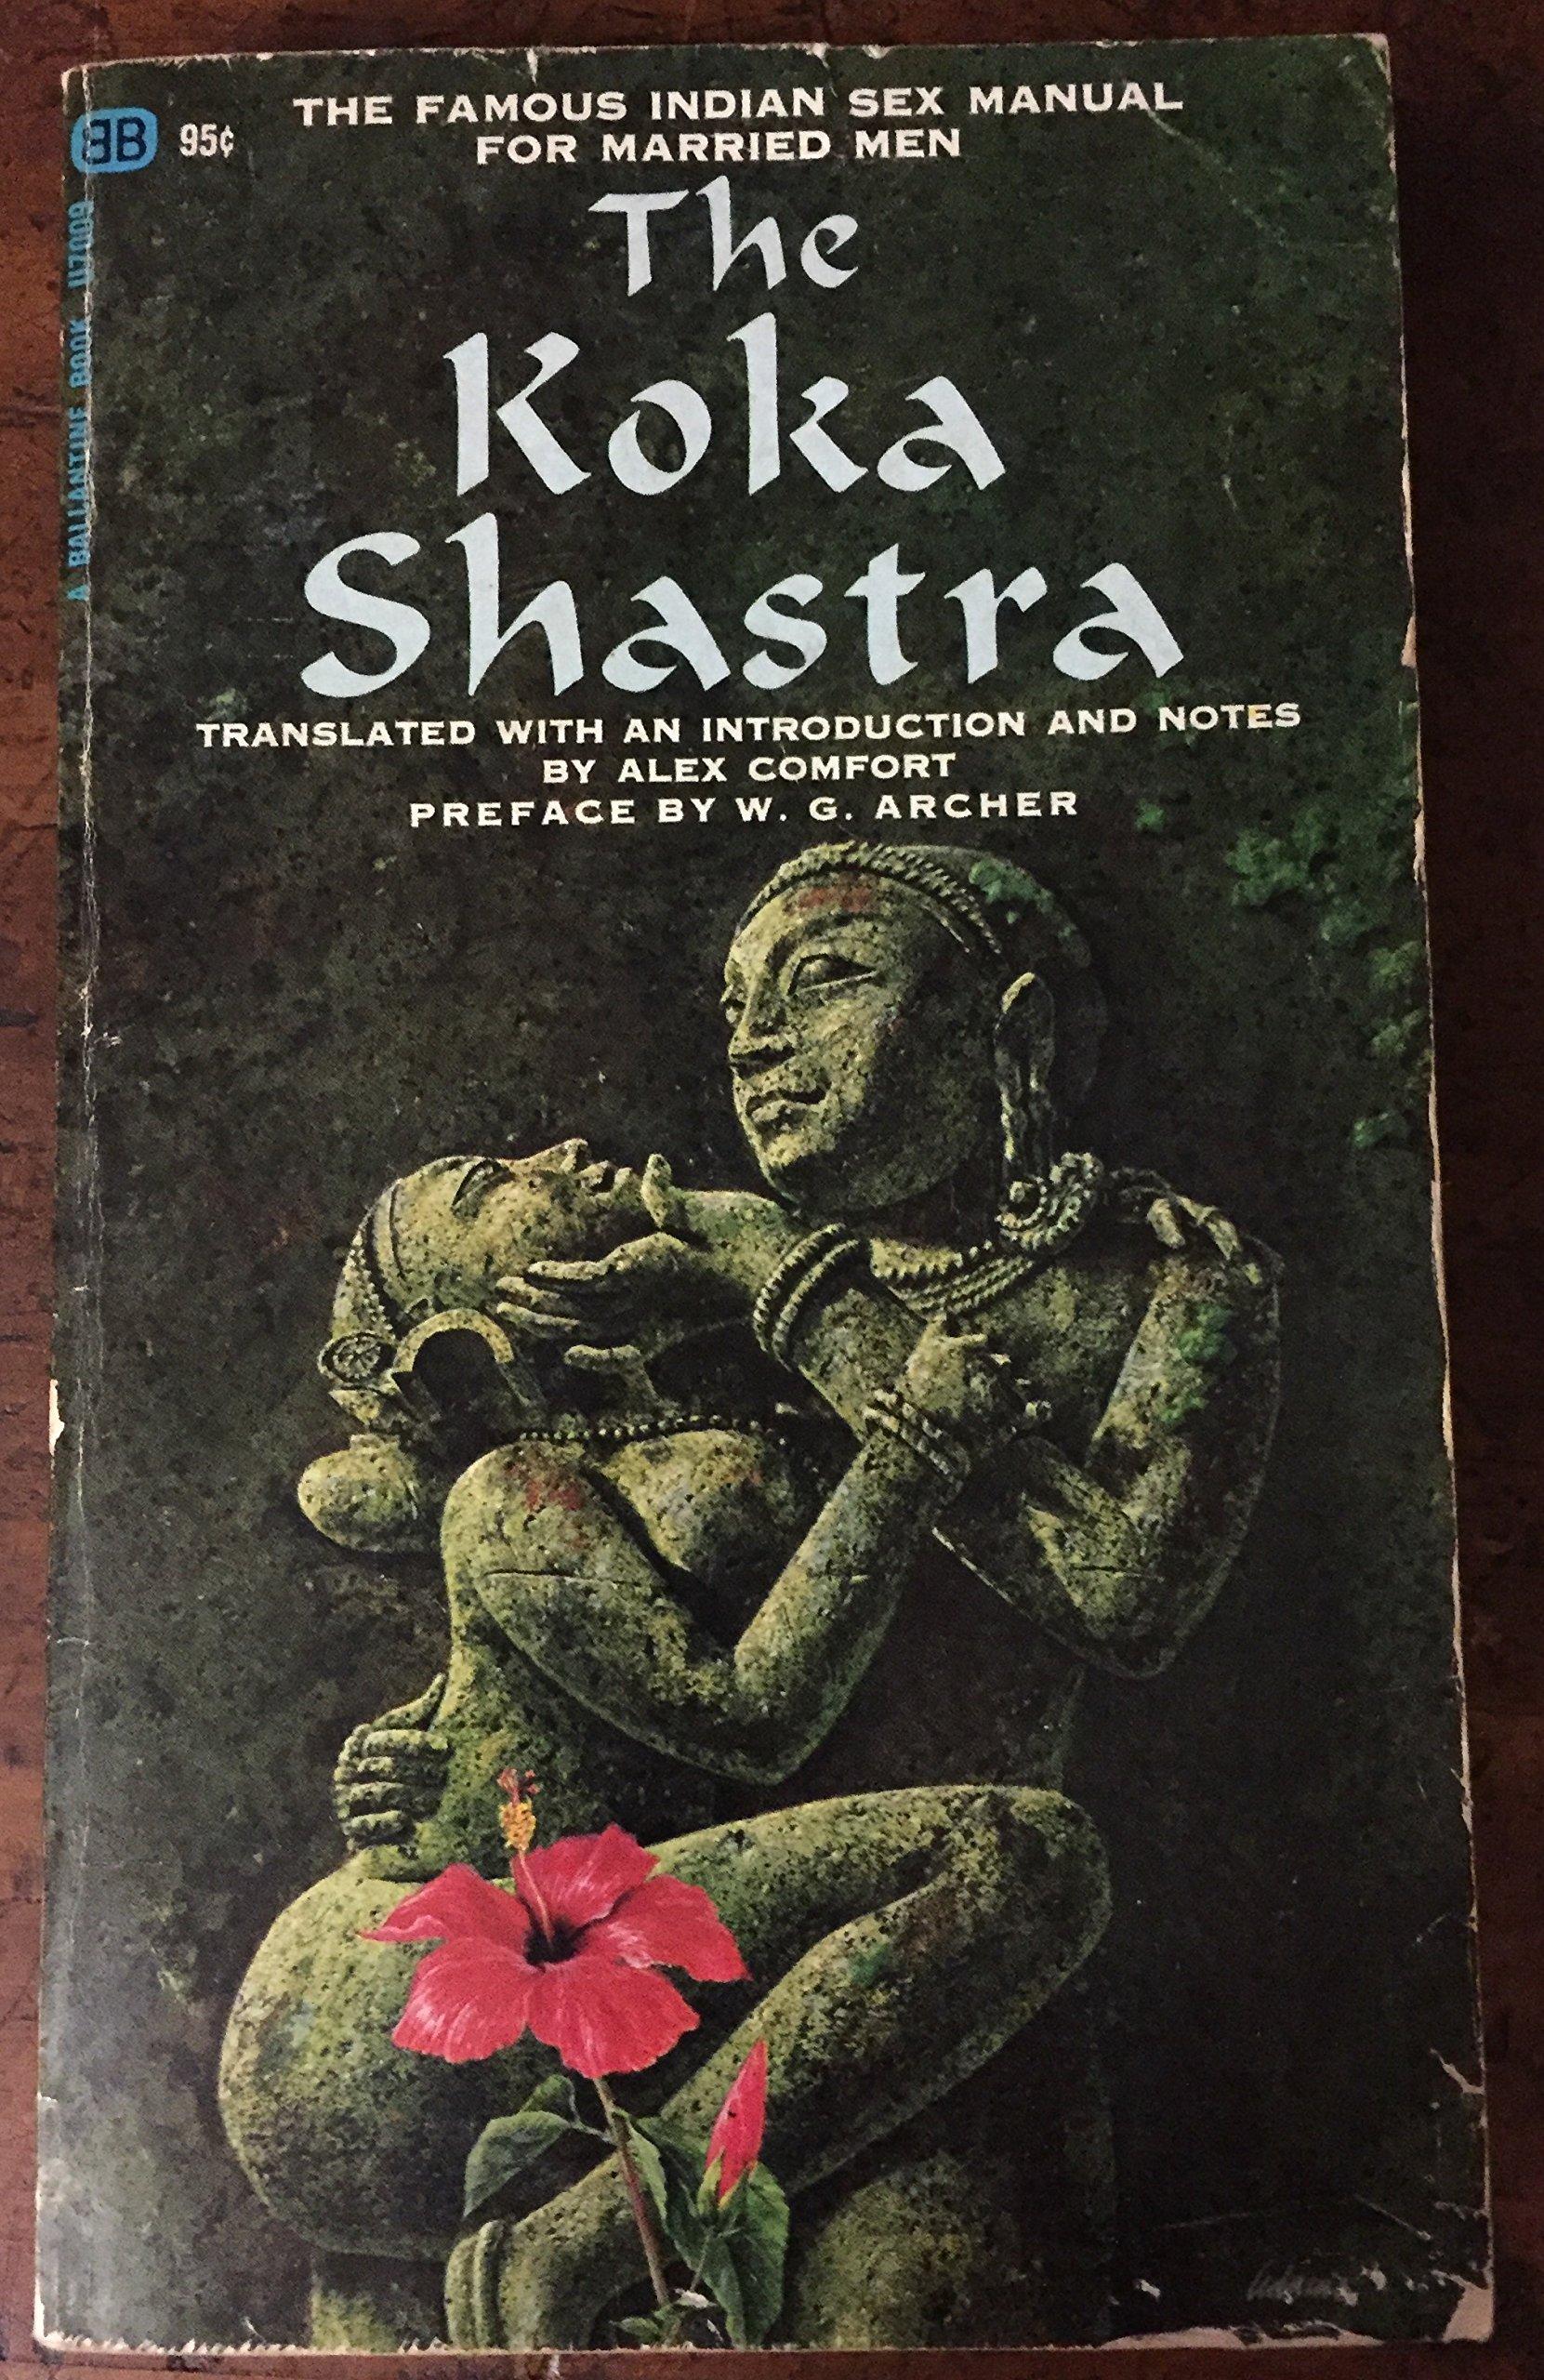 Koka Shastra Book In Hindi Language.pdf